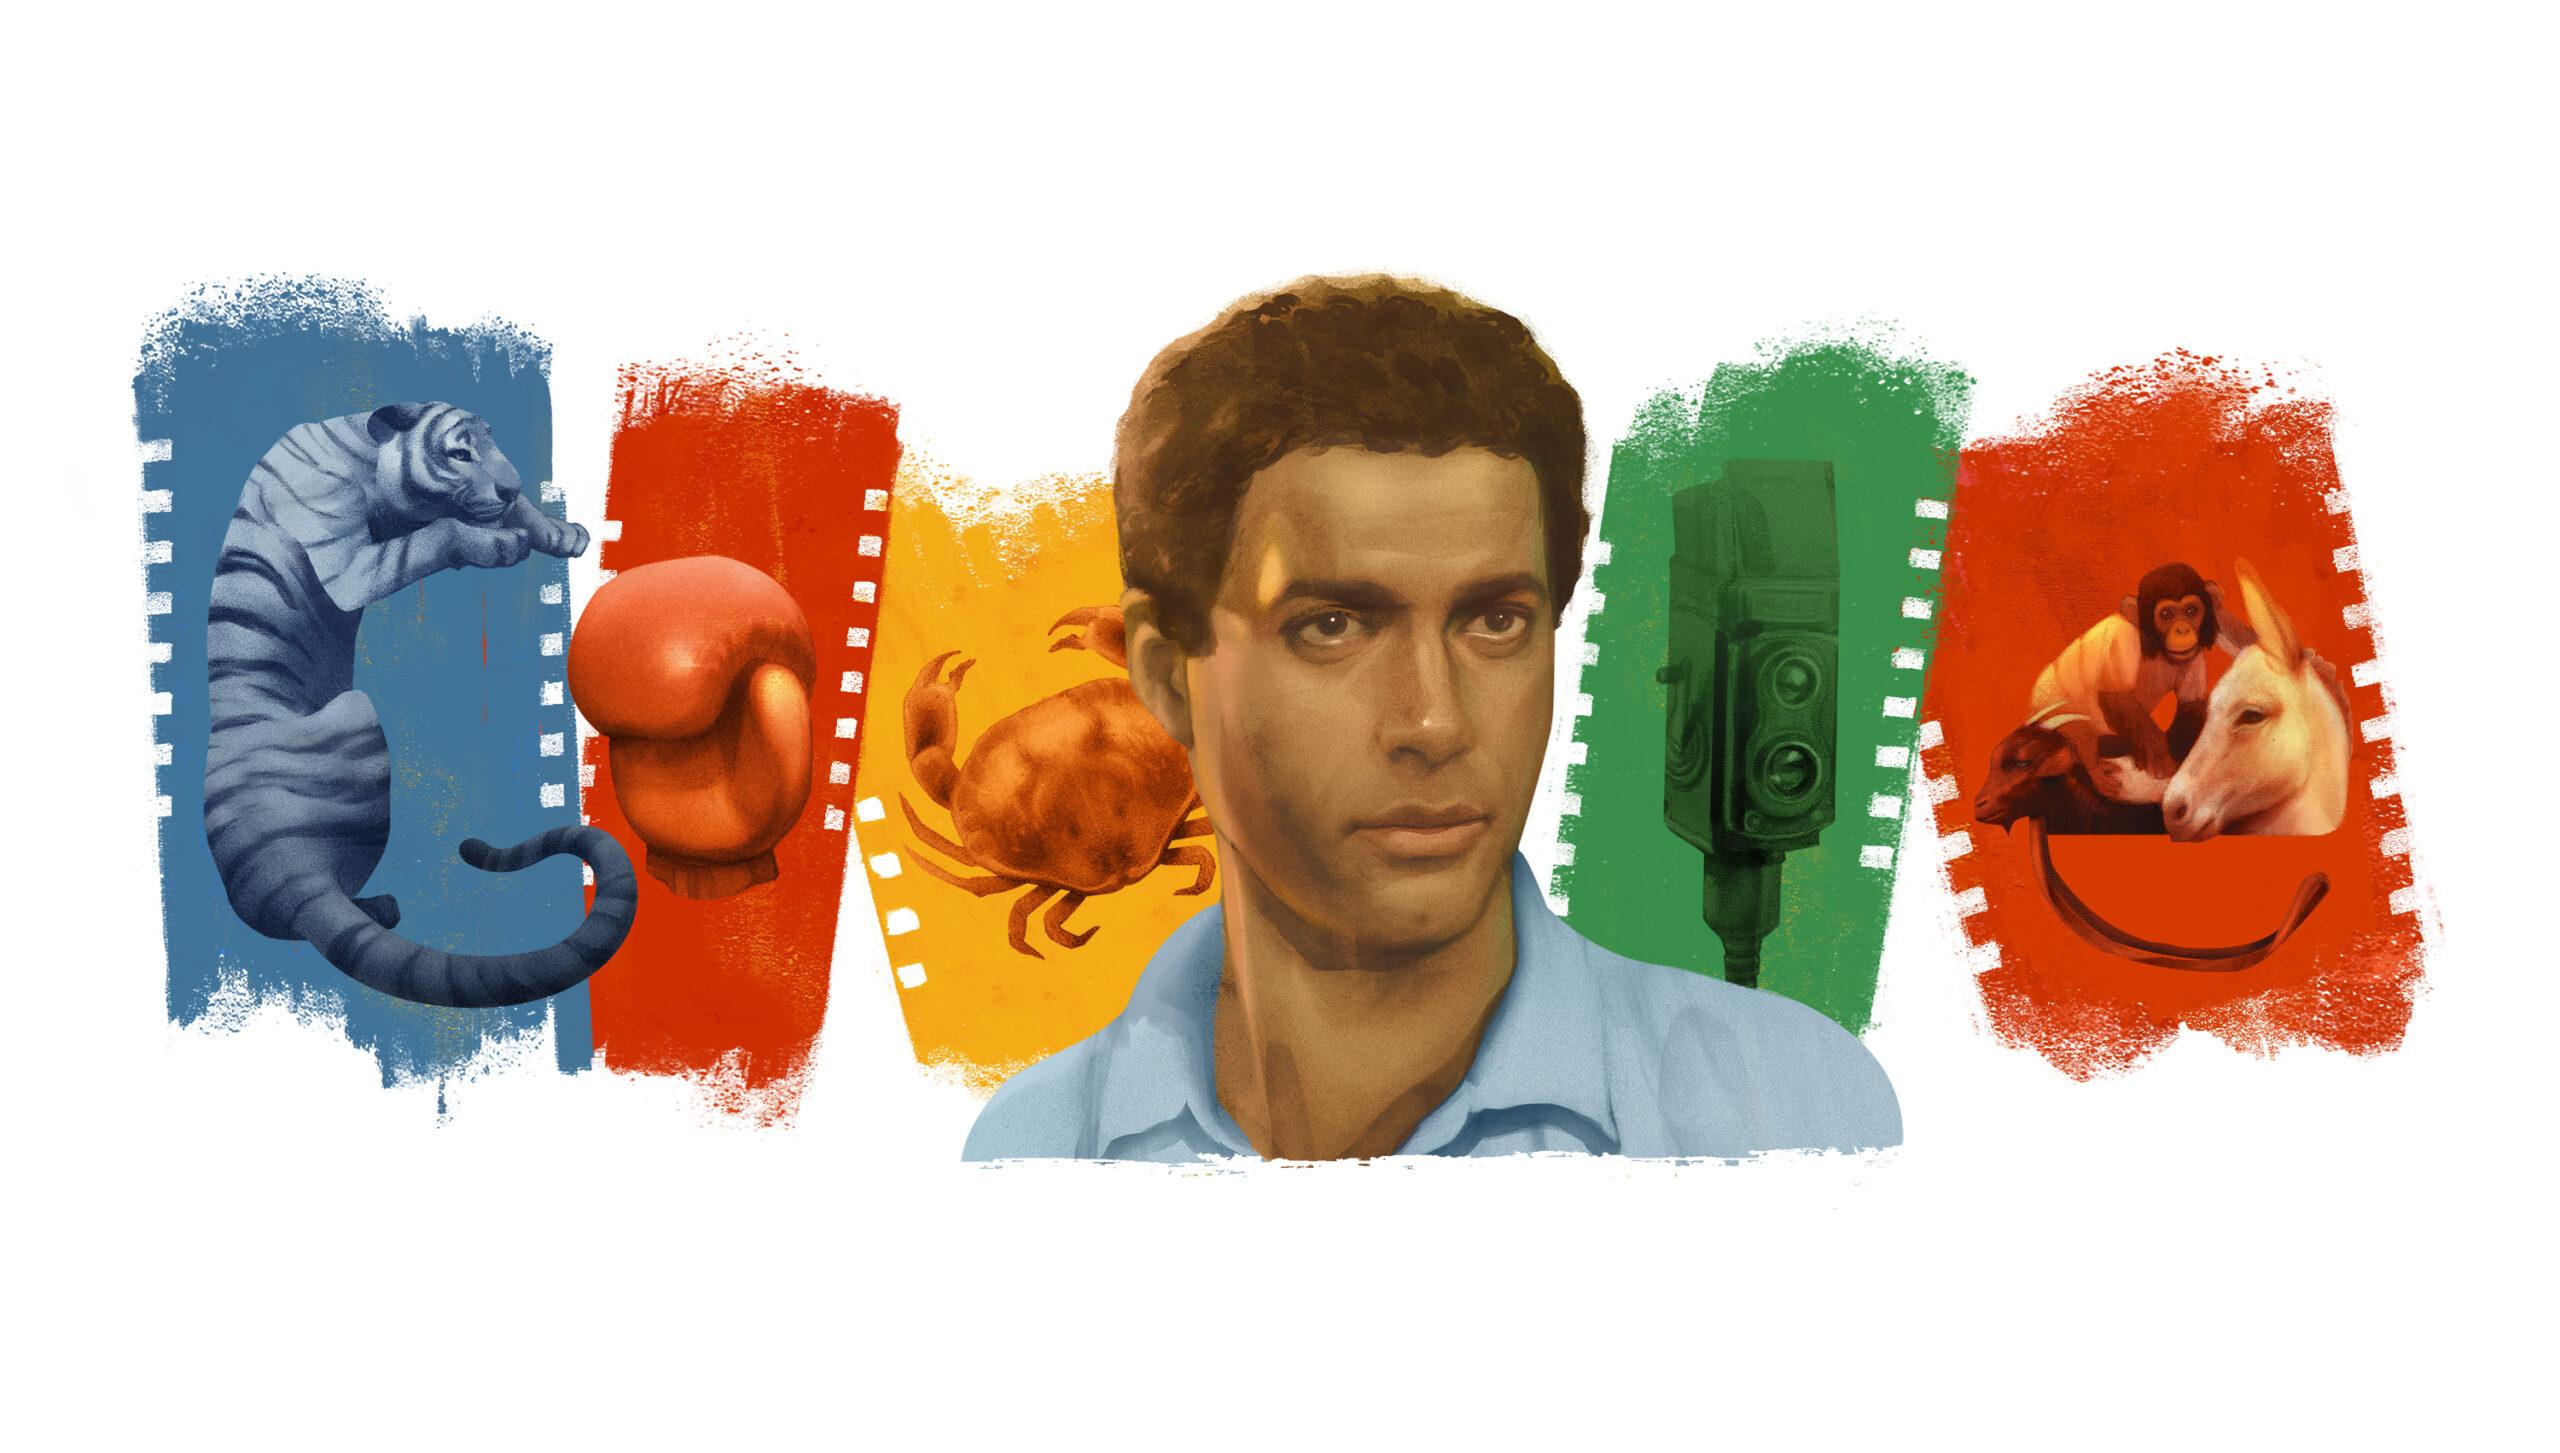 Ahmed Zaki's google doodle